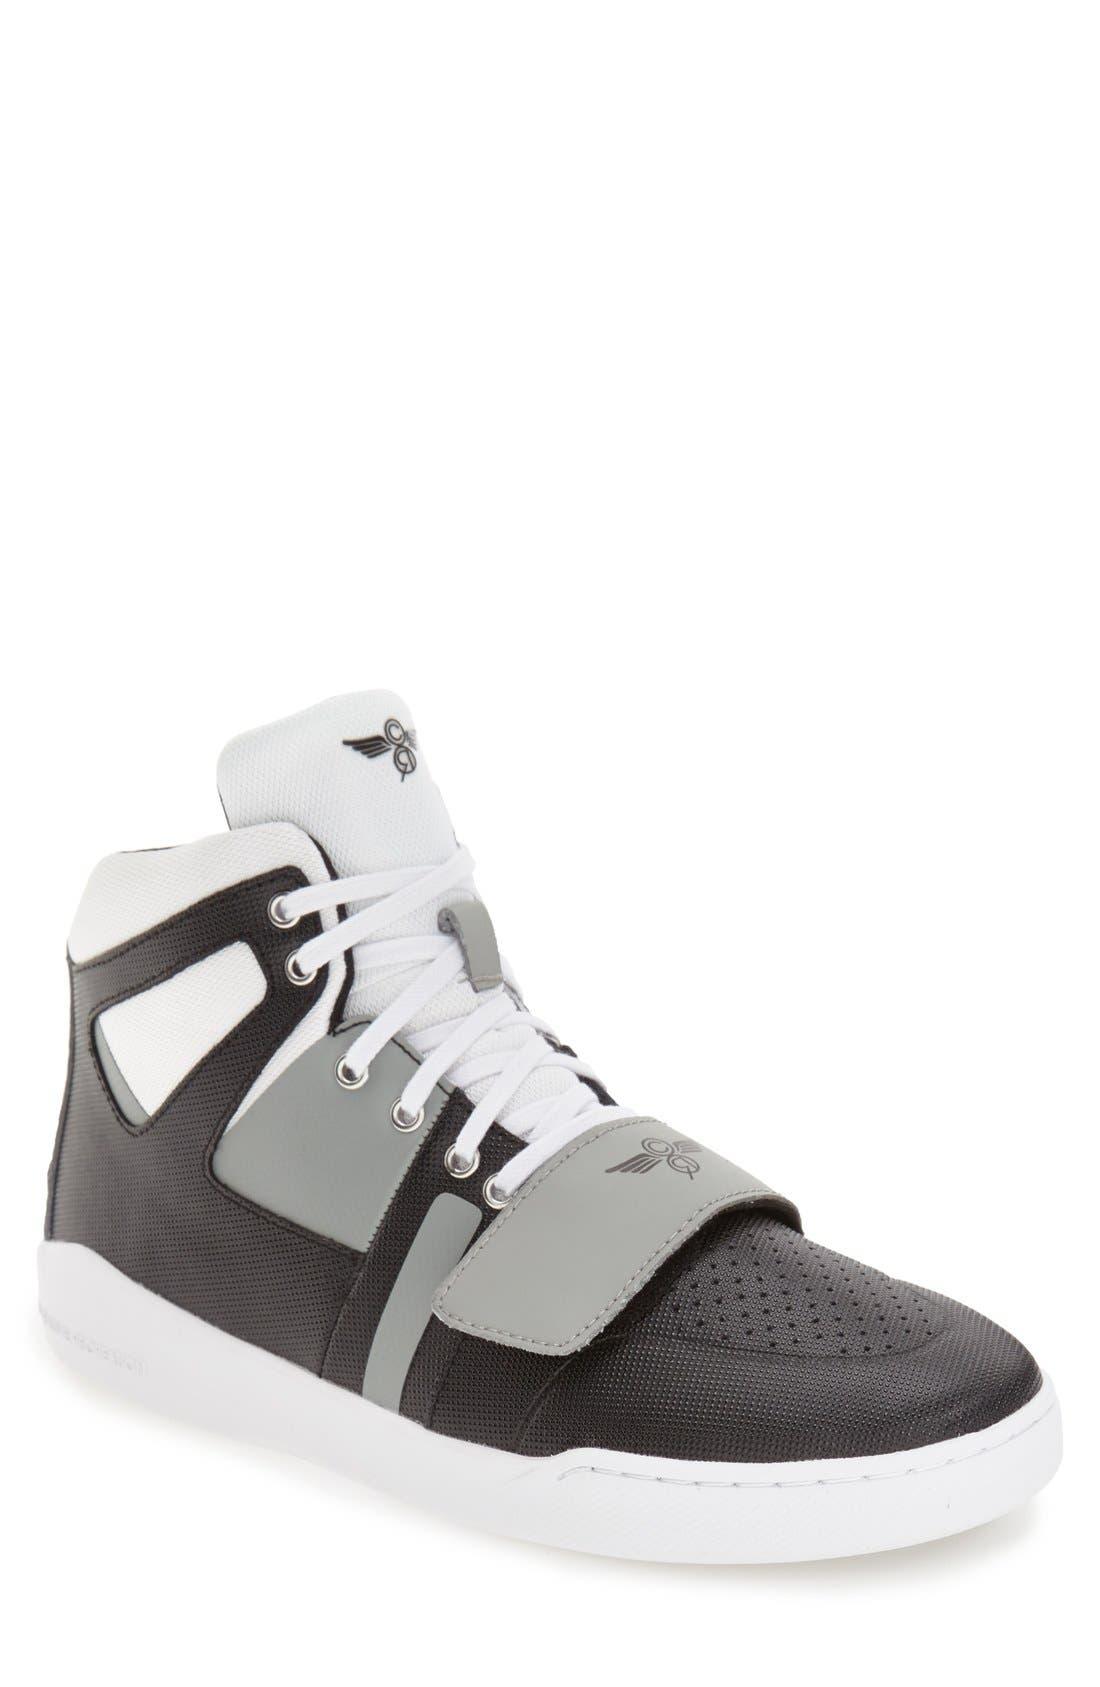 Main Image - Creative Recreation 'Manzo' Sneaker (Men)